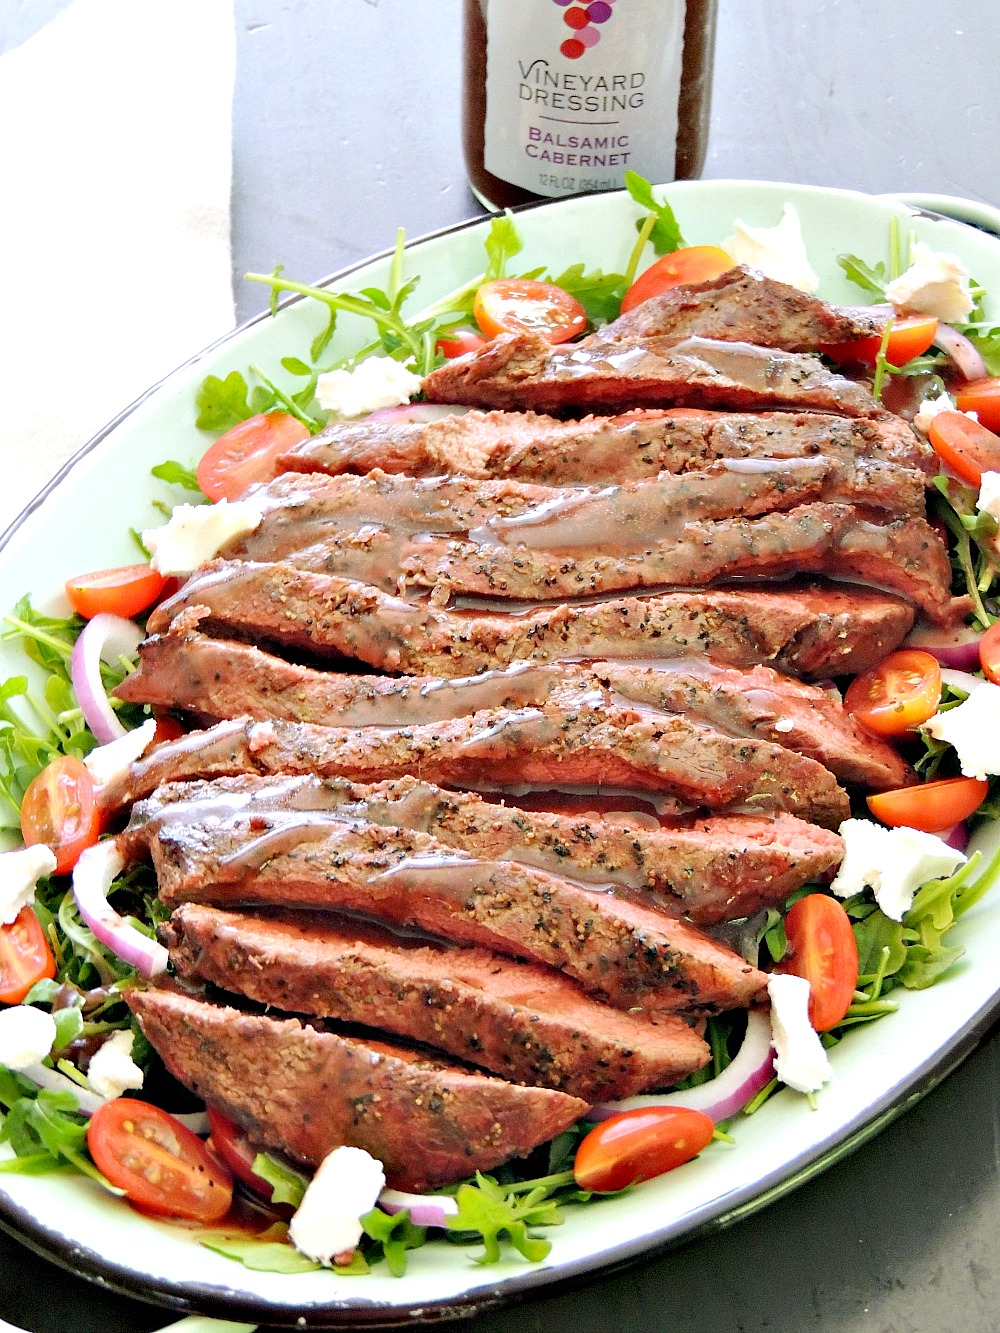 Grilled Steak Salad With Balsamic Cabernet Dressing